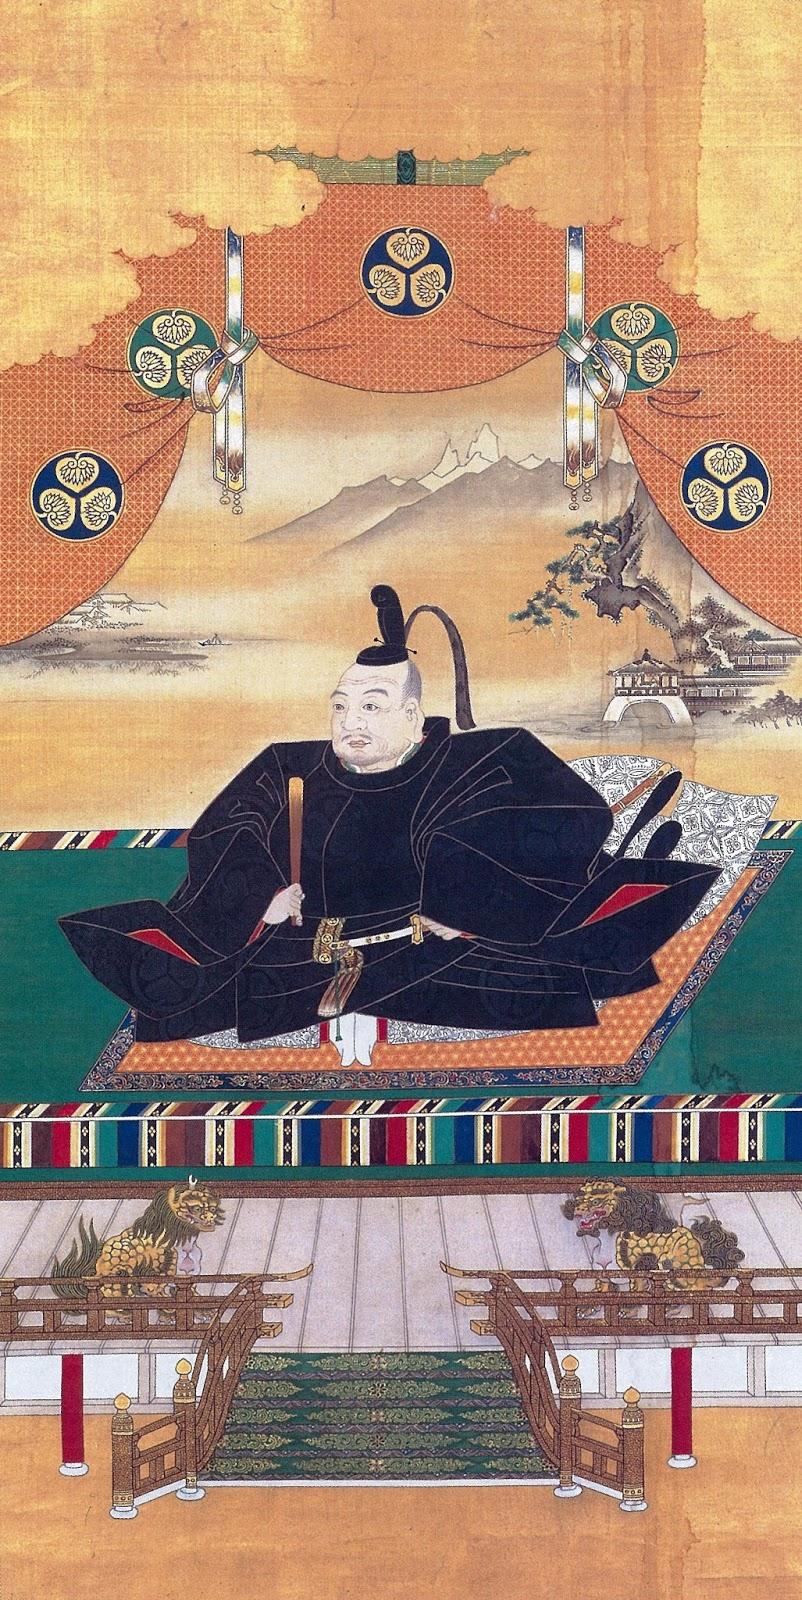 a biography of tokugawa ieyasu a japanese shogun Tokugawa ietsugu  徳川 家継 (august 8, 1709 – june 19, 1716) was the seventh shogun of the tokugawa dynasty , who ruled from 1713 until his death in 1716 he was the son of tokugawa ienobu , thus making him the grandson of tokugawa tsunashige , daimyo of kofu , great-grandson of tokugawa iemitsu , great-great grandson of tokugawa.